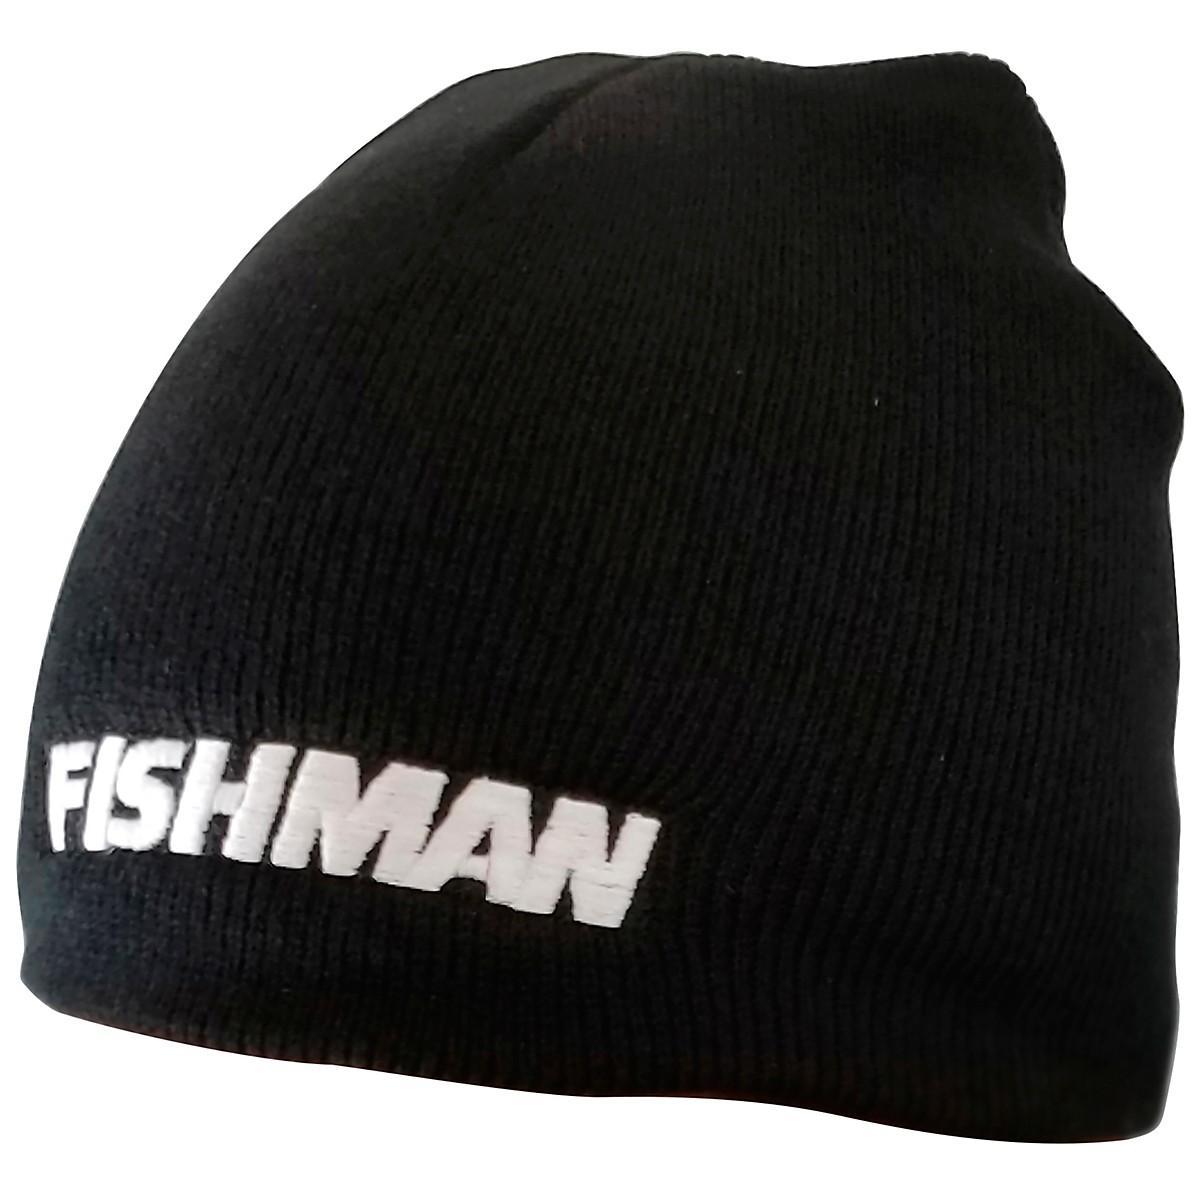 Fishman Fishman Beanie, One Size Fits All